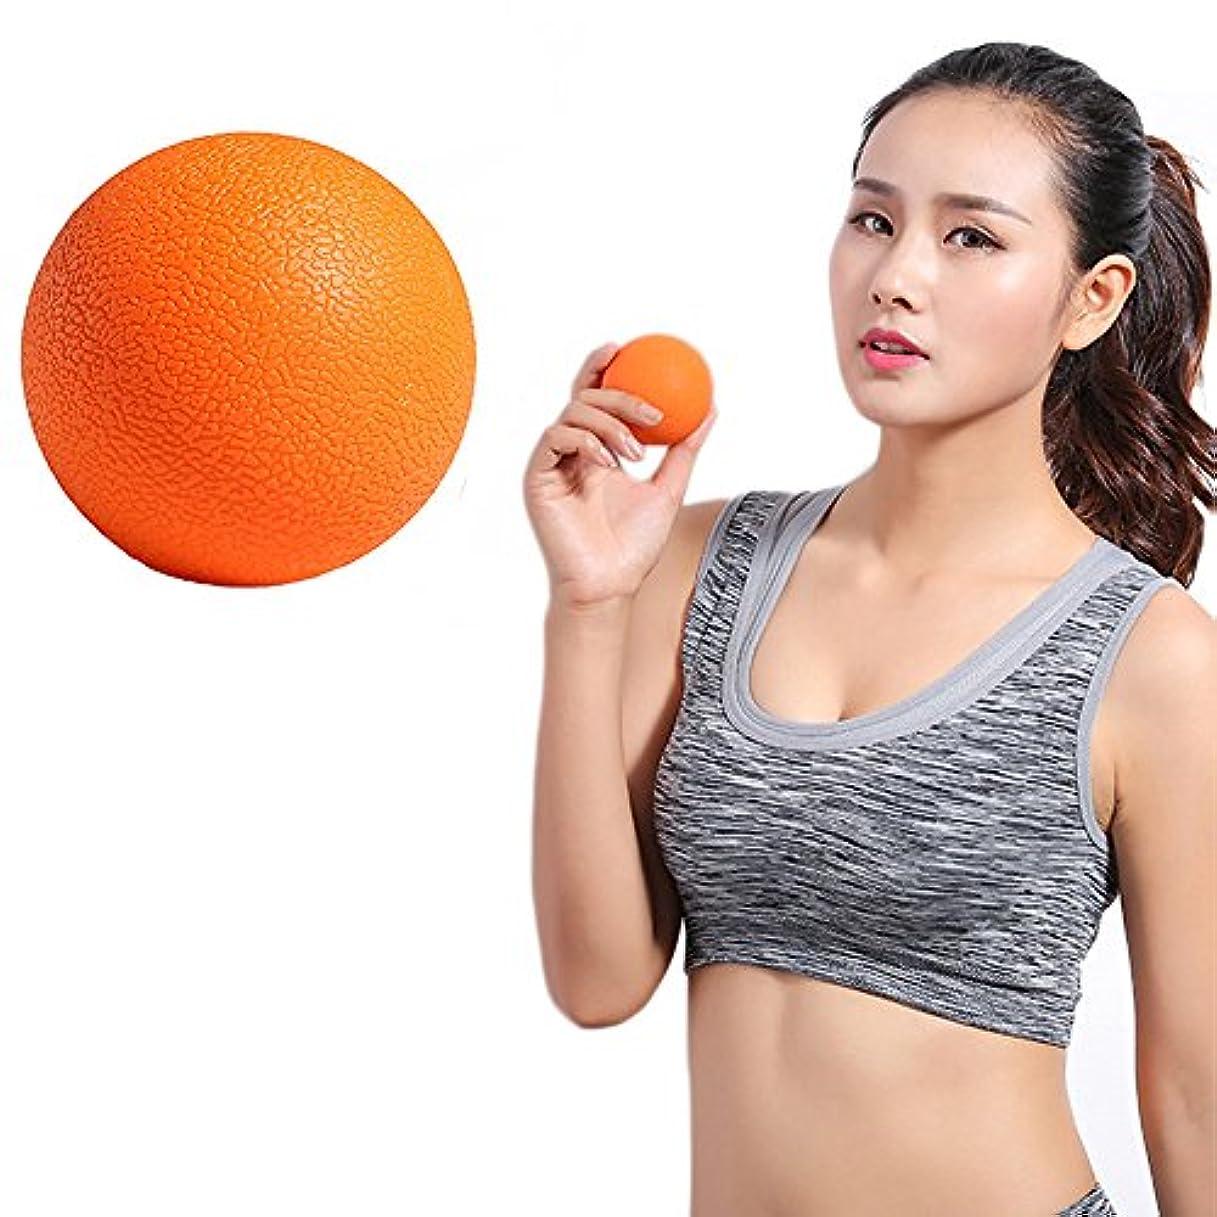 Zafina マッサージボール トリガーポイント ストレッチボール 筋膜球 筋膜リリース 指圧ボール 首から足裏まで全身に使える 血液循環 エクササイズグッズ 1個入り (オレンジ)